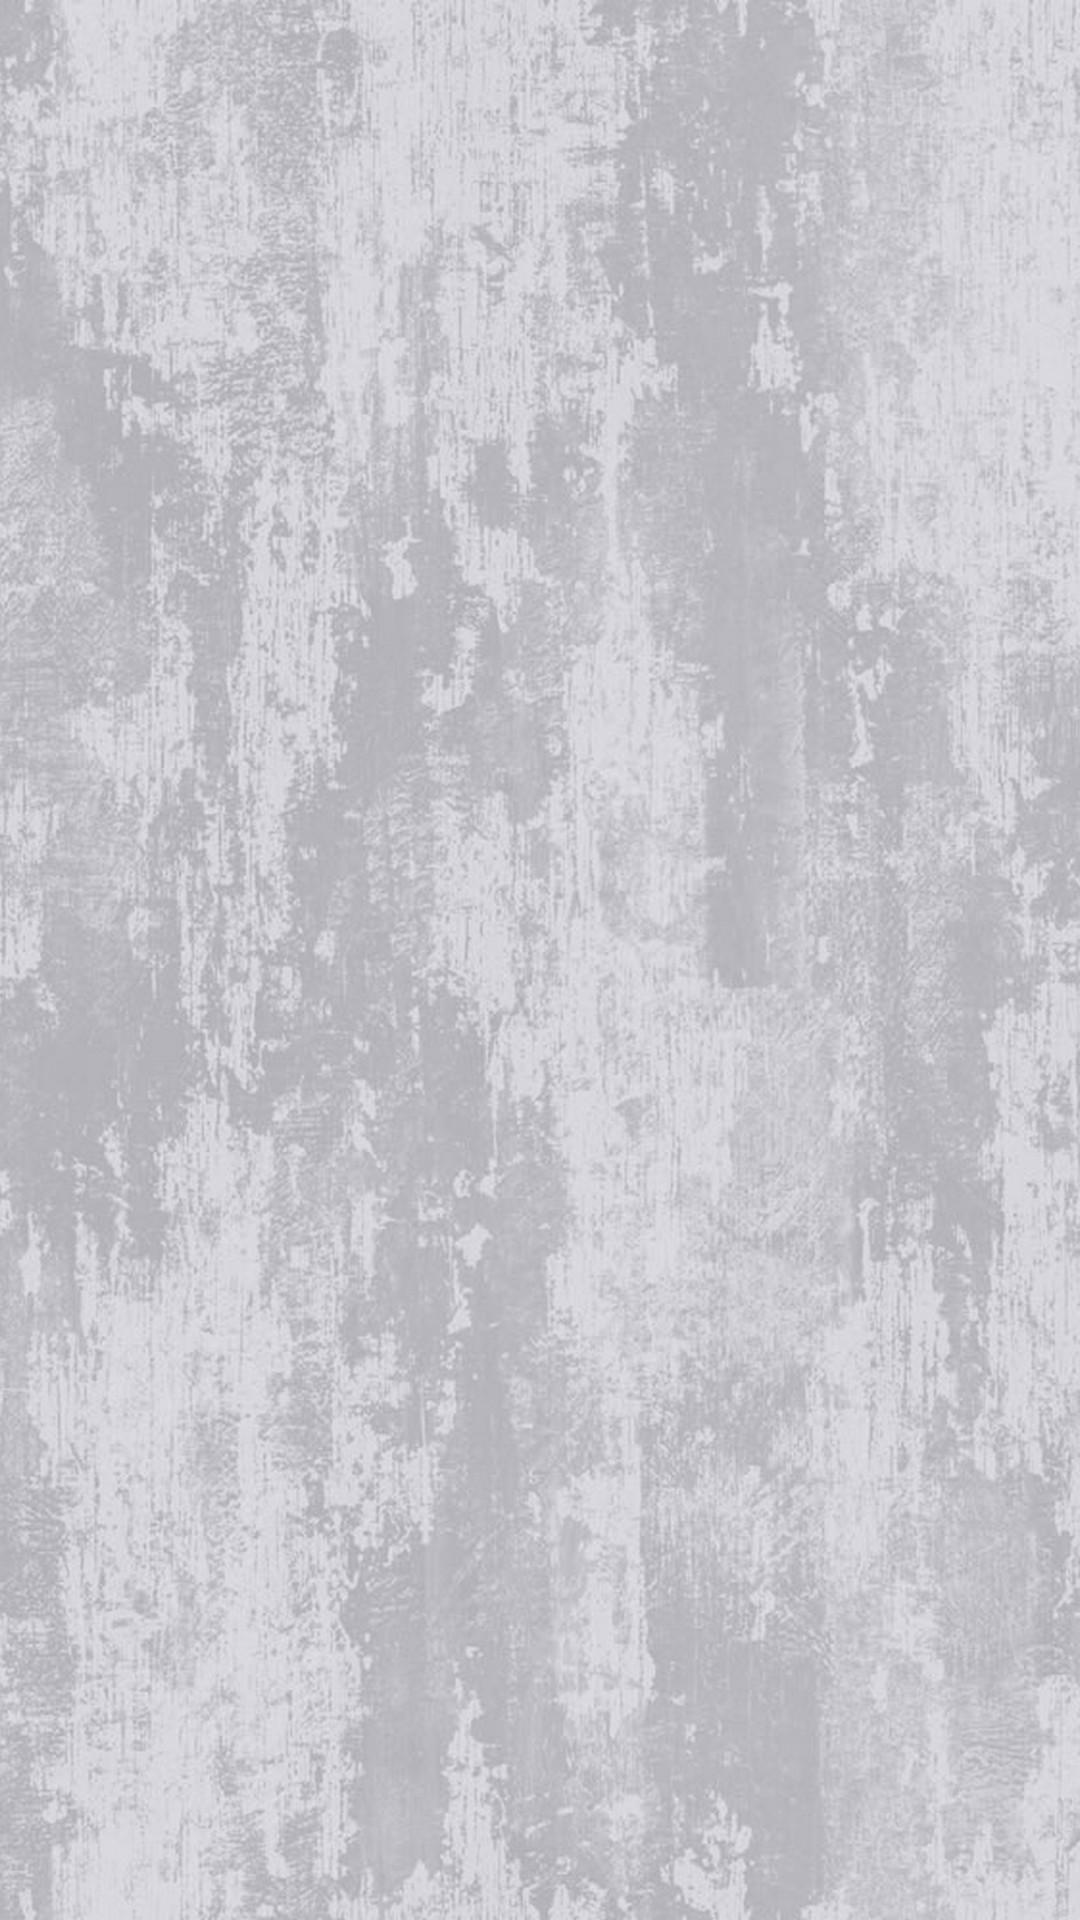 Iphone X Wallpaper Foil